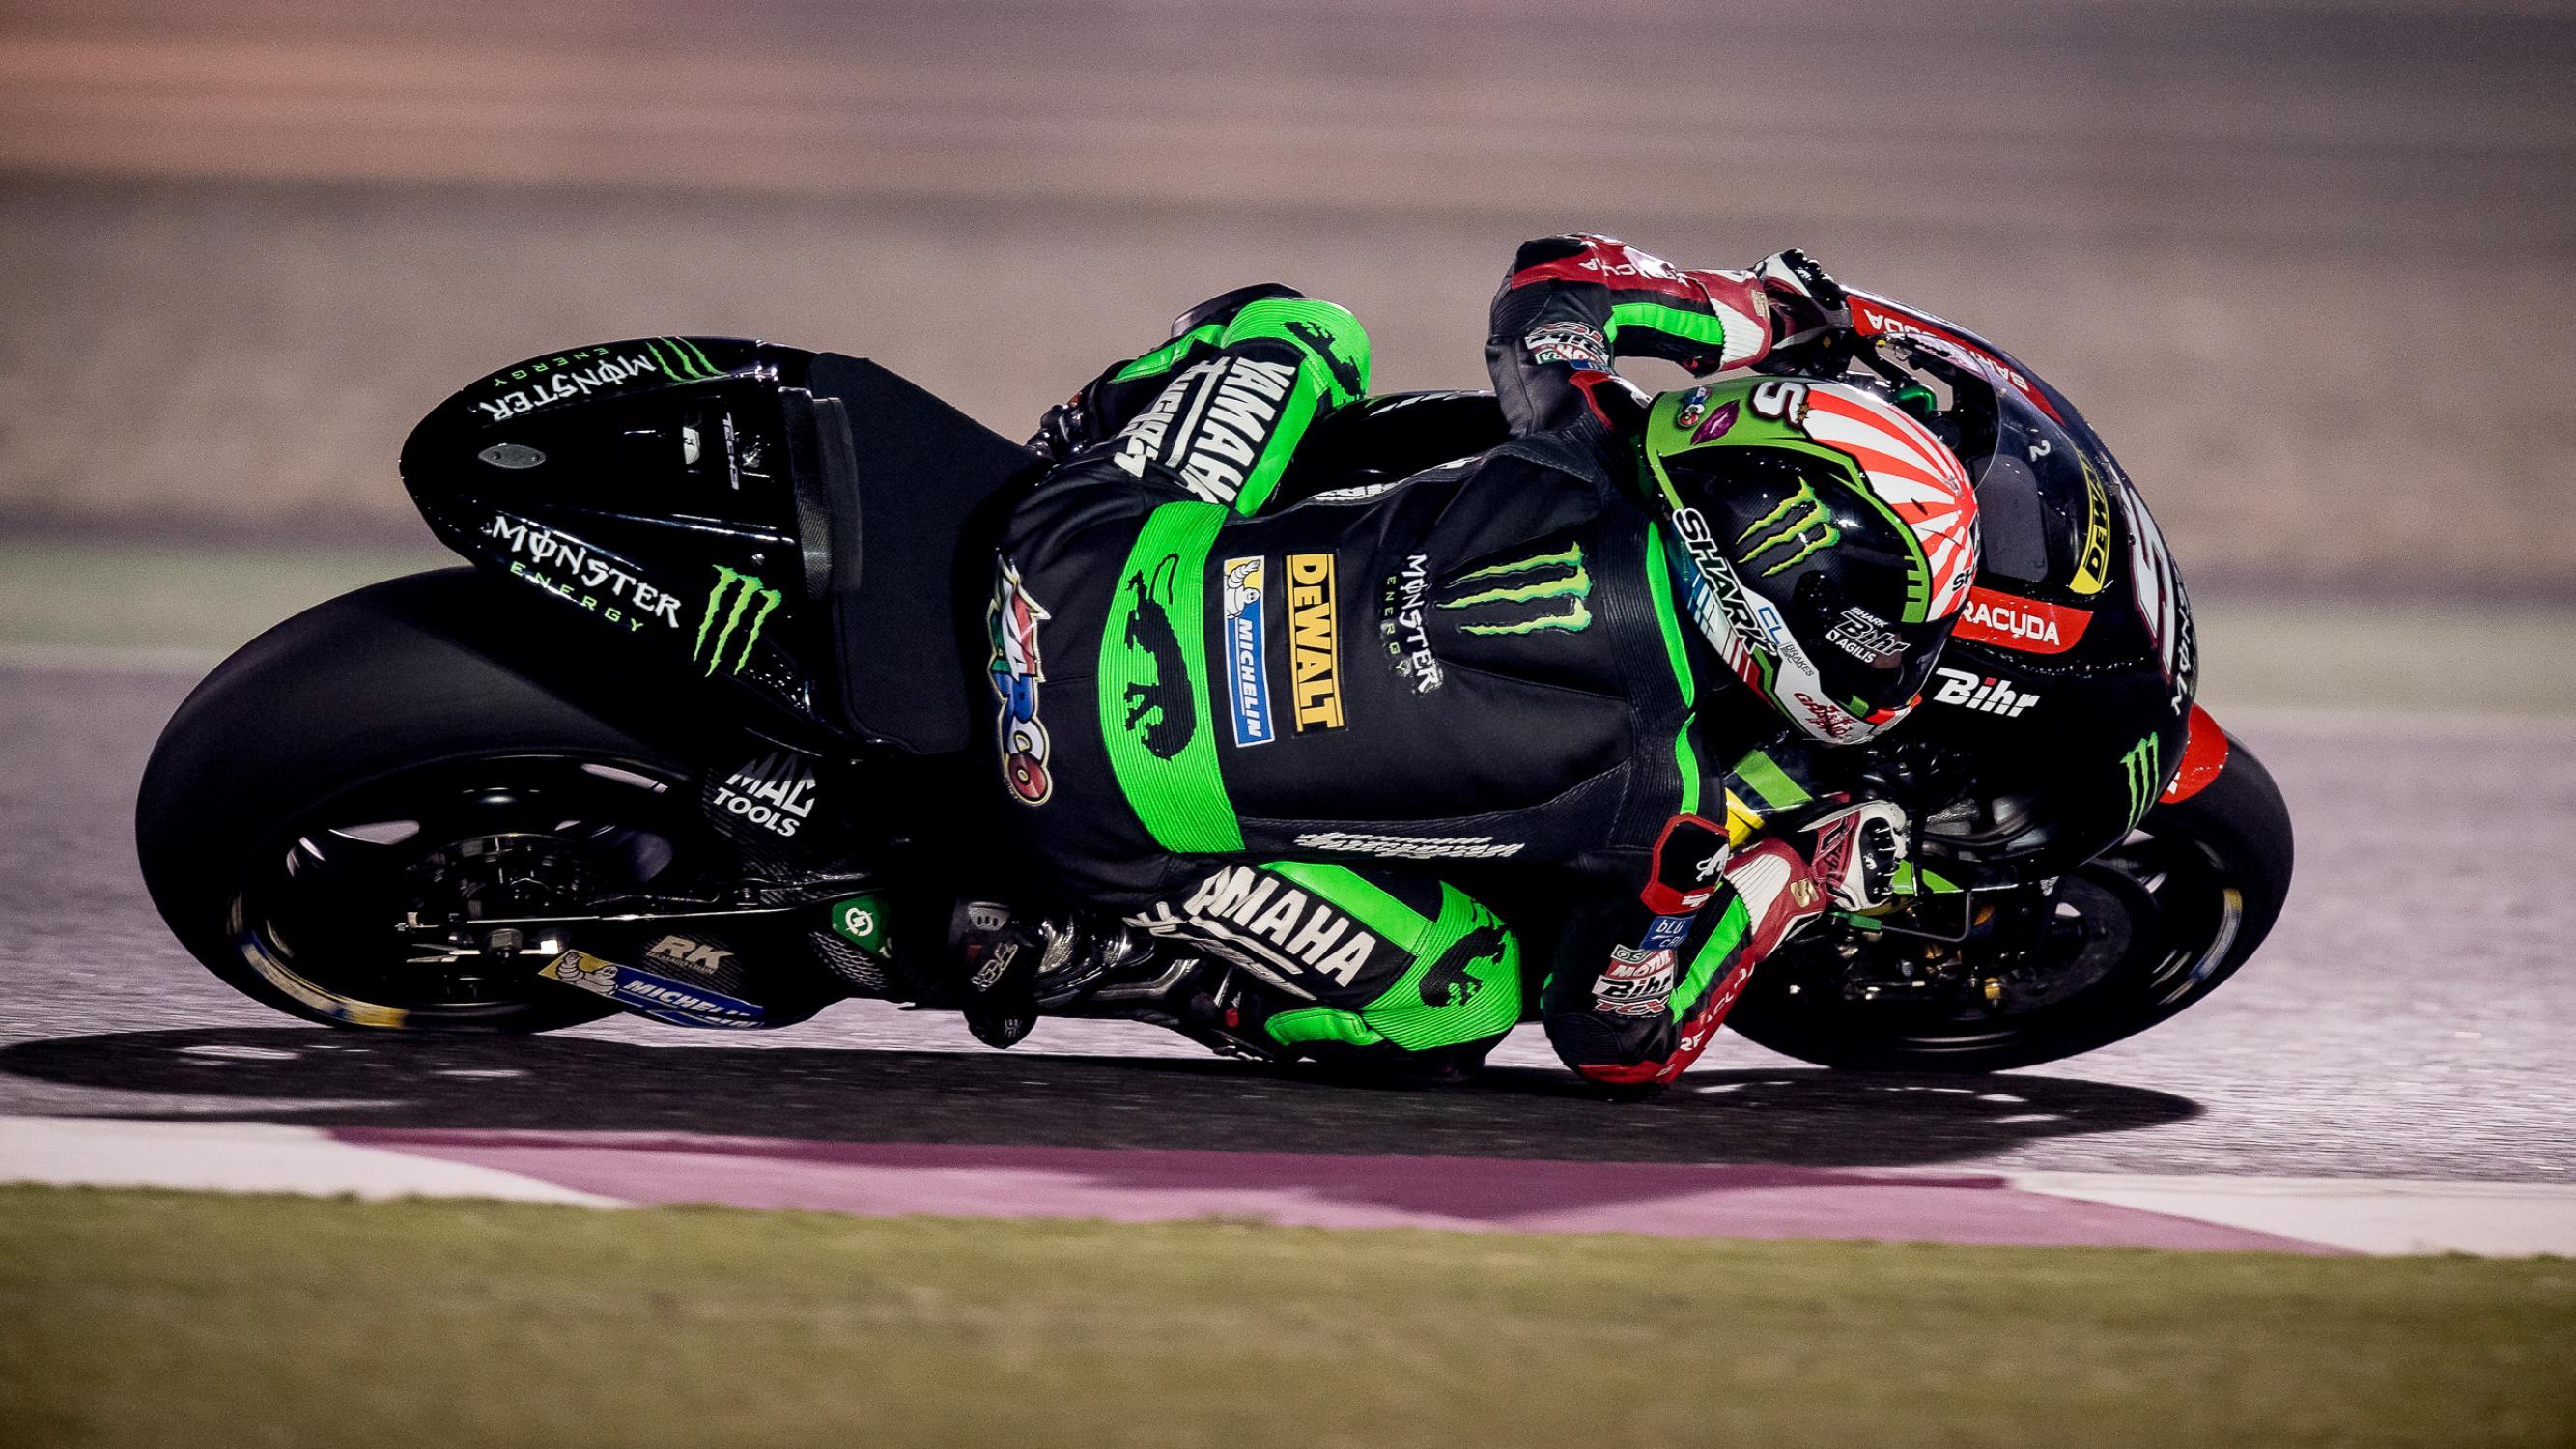 [MotoGP] Test Losail 05-johann-zarco-frazarco-qatar-doha-test-2017-2.gallery_full_top_fullscreen